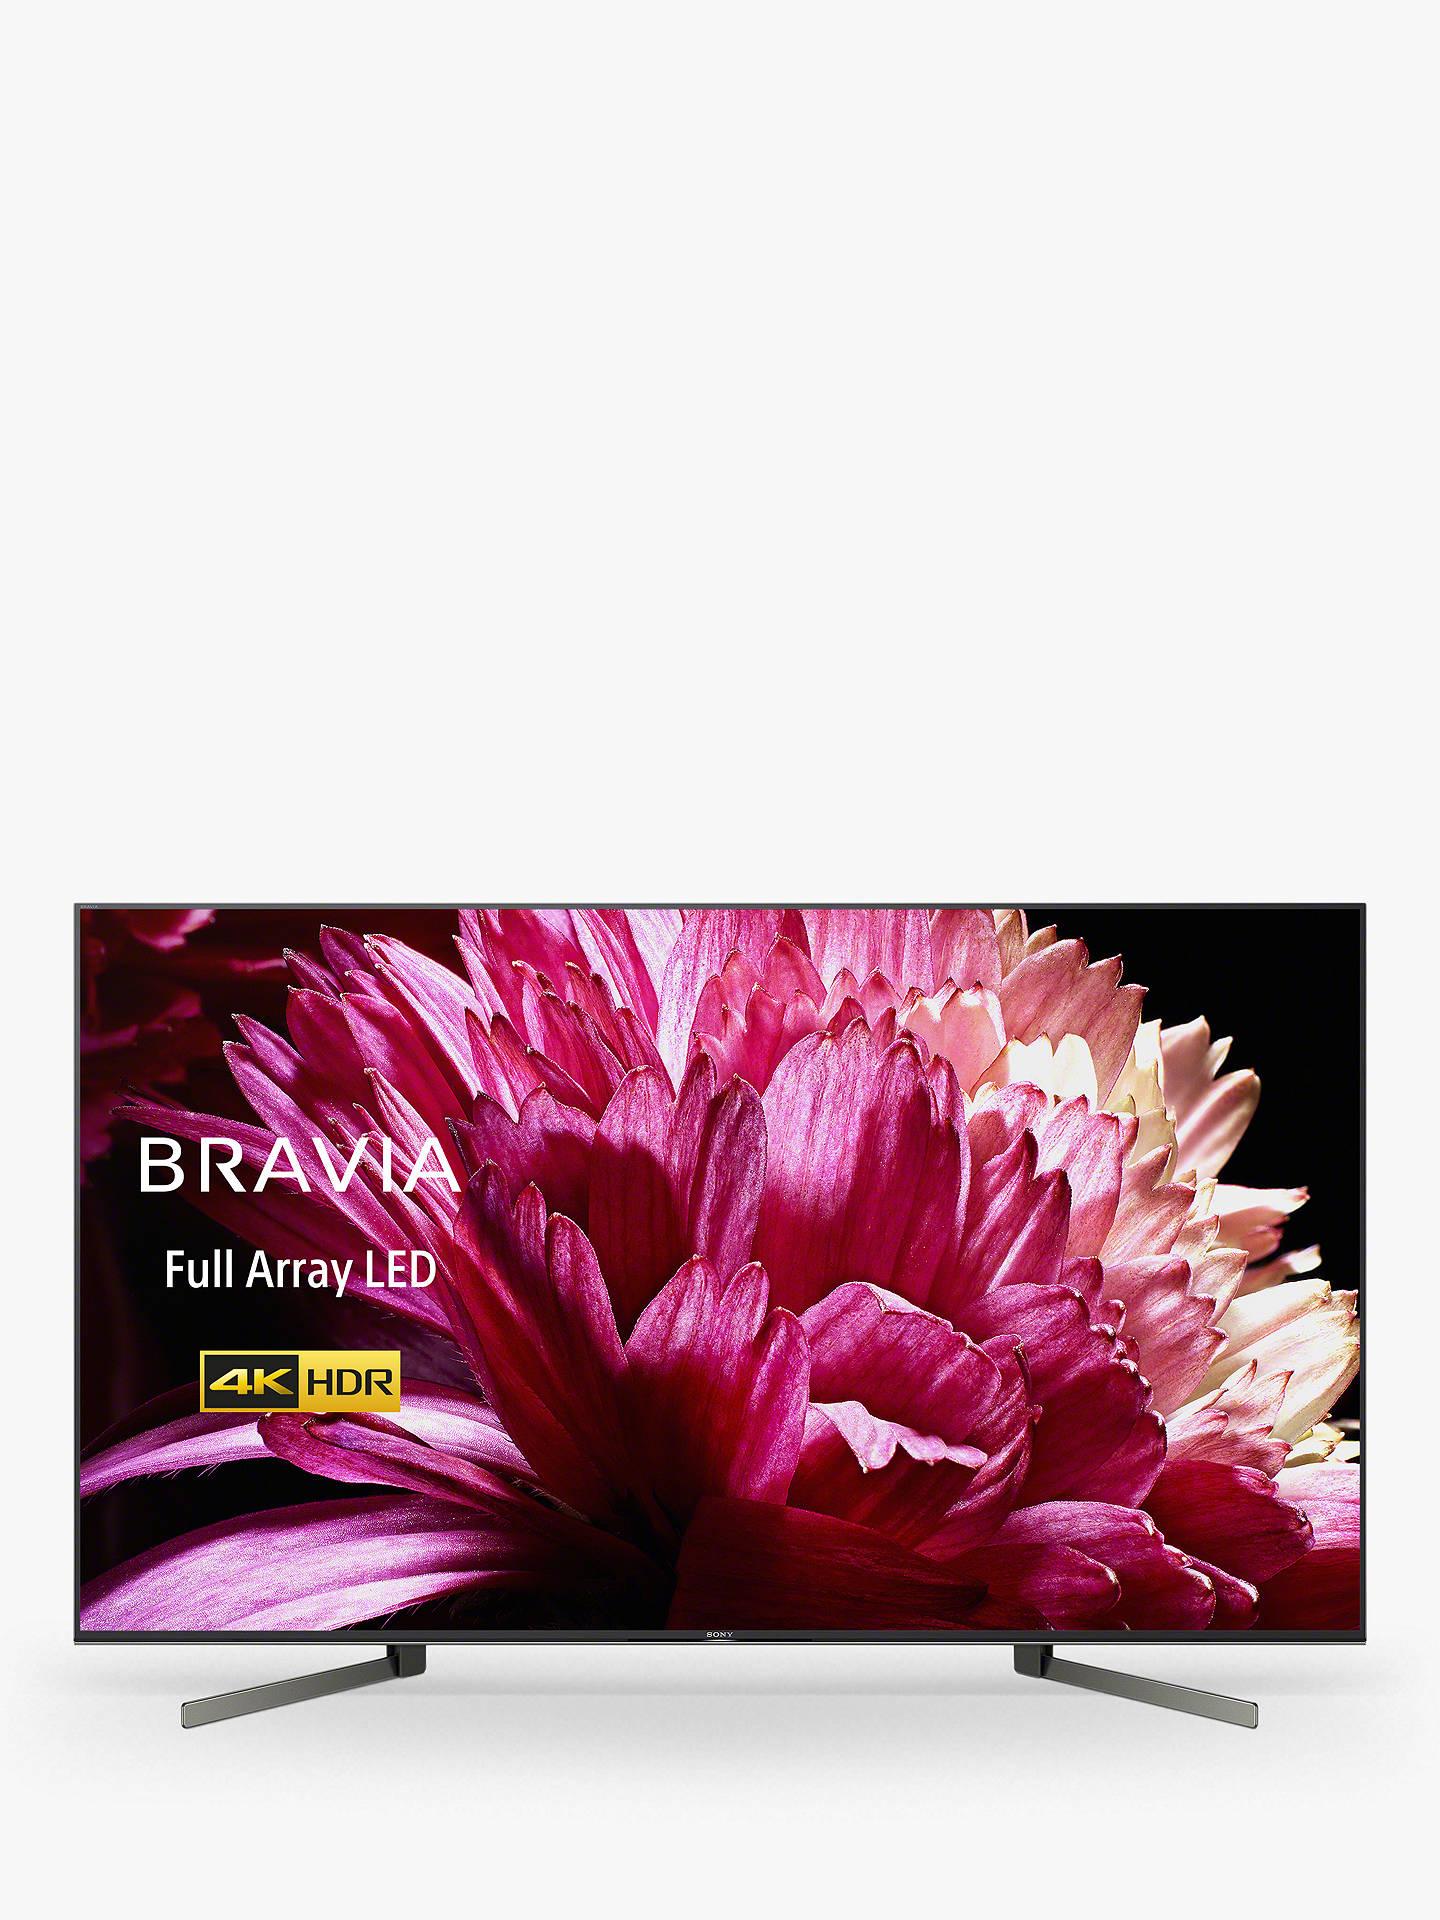 "Sony Bravia KD65XG9505 2019 LED HDR 4K Smart Android TV, 65"" (£1,099 Inc voucher) £1,199 at John Lewis & Partners"